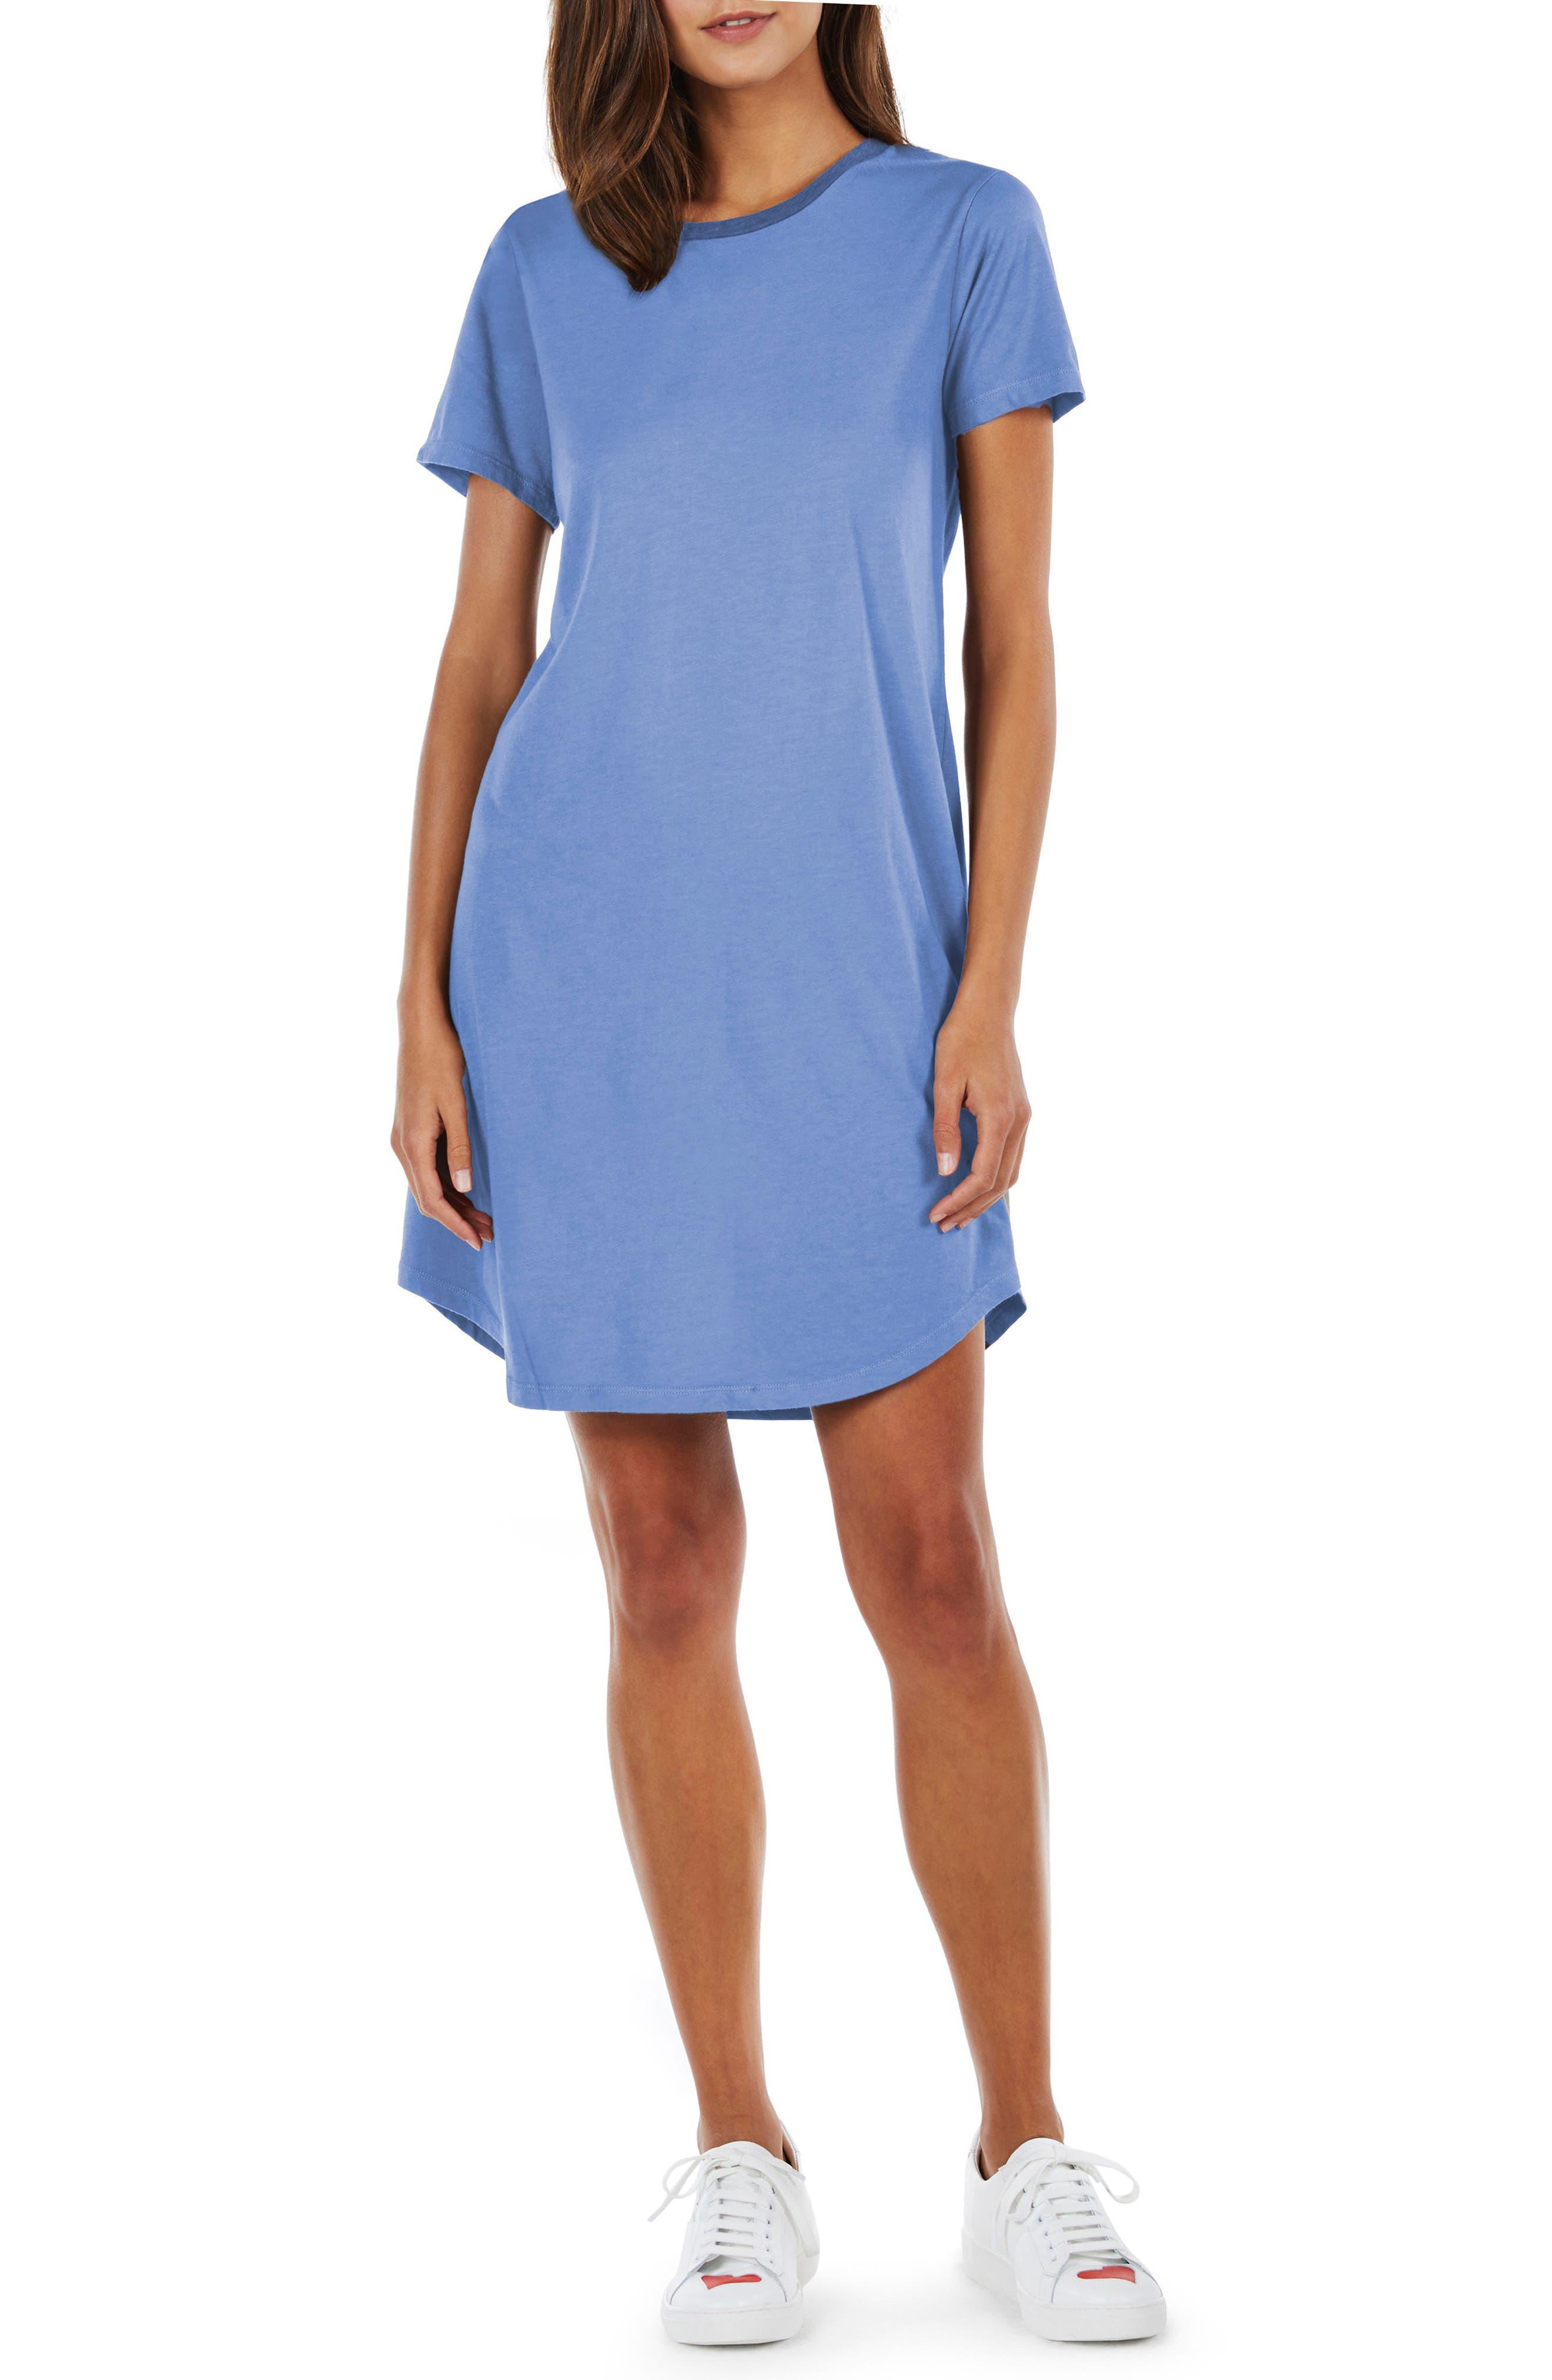 Main Image - Michael Stars Ringer T-Shirt Dress